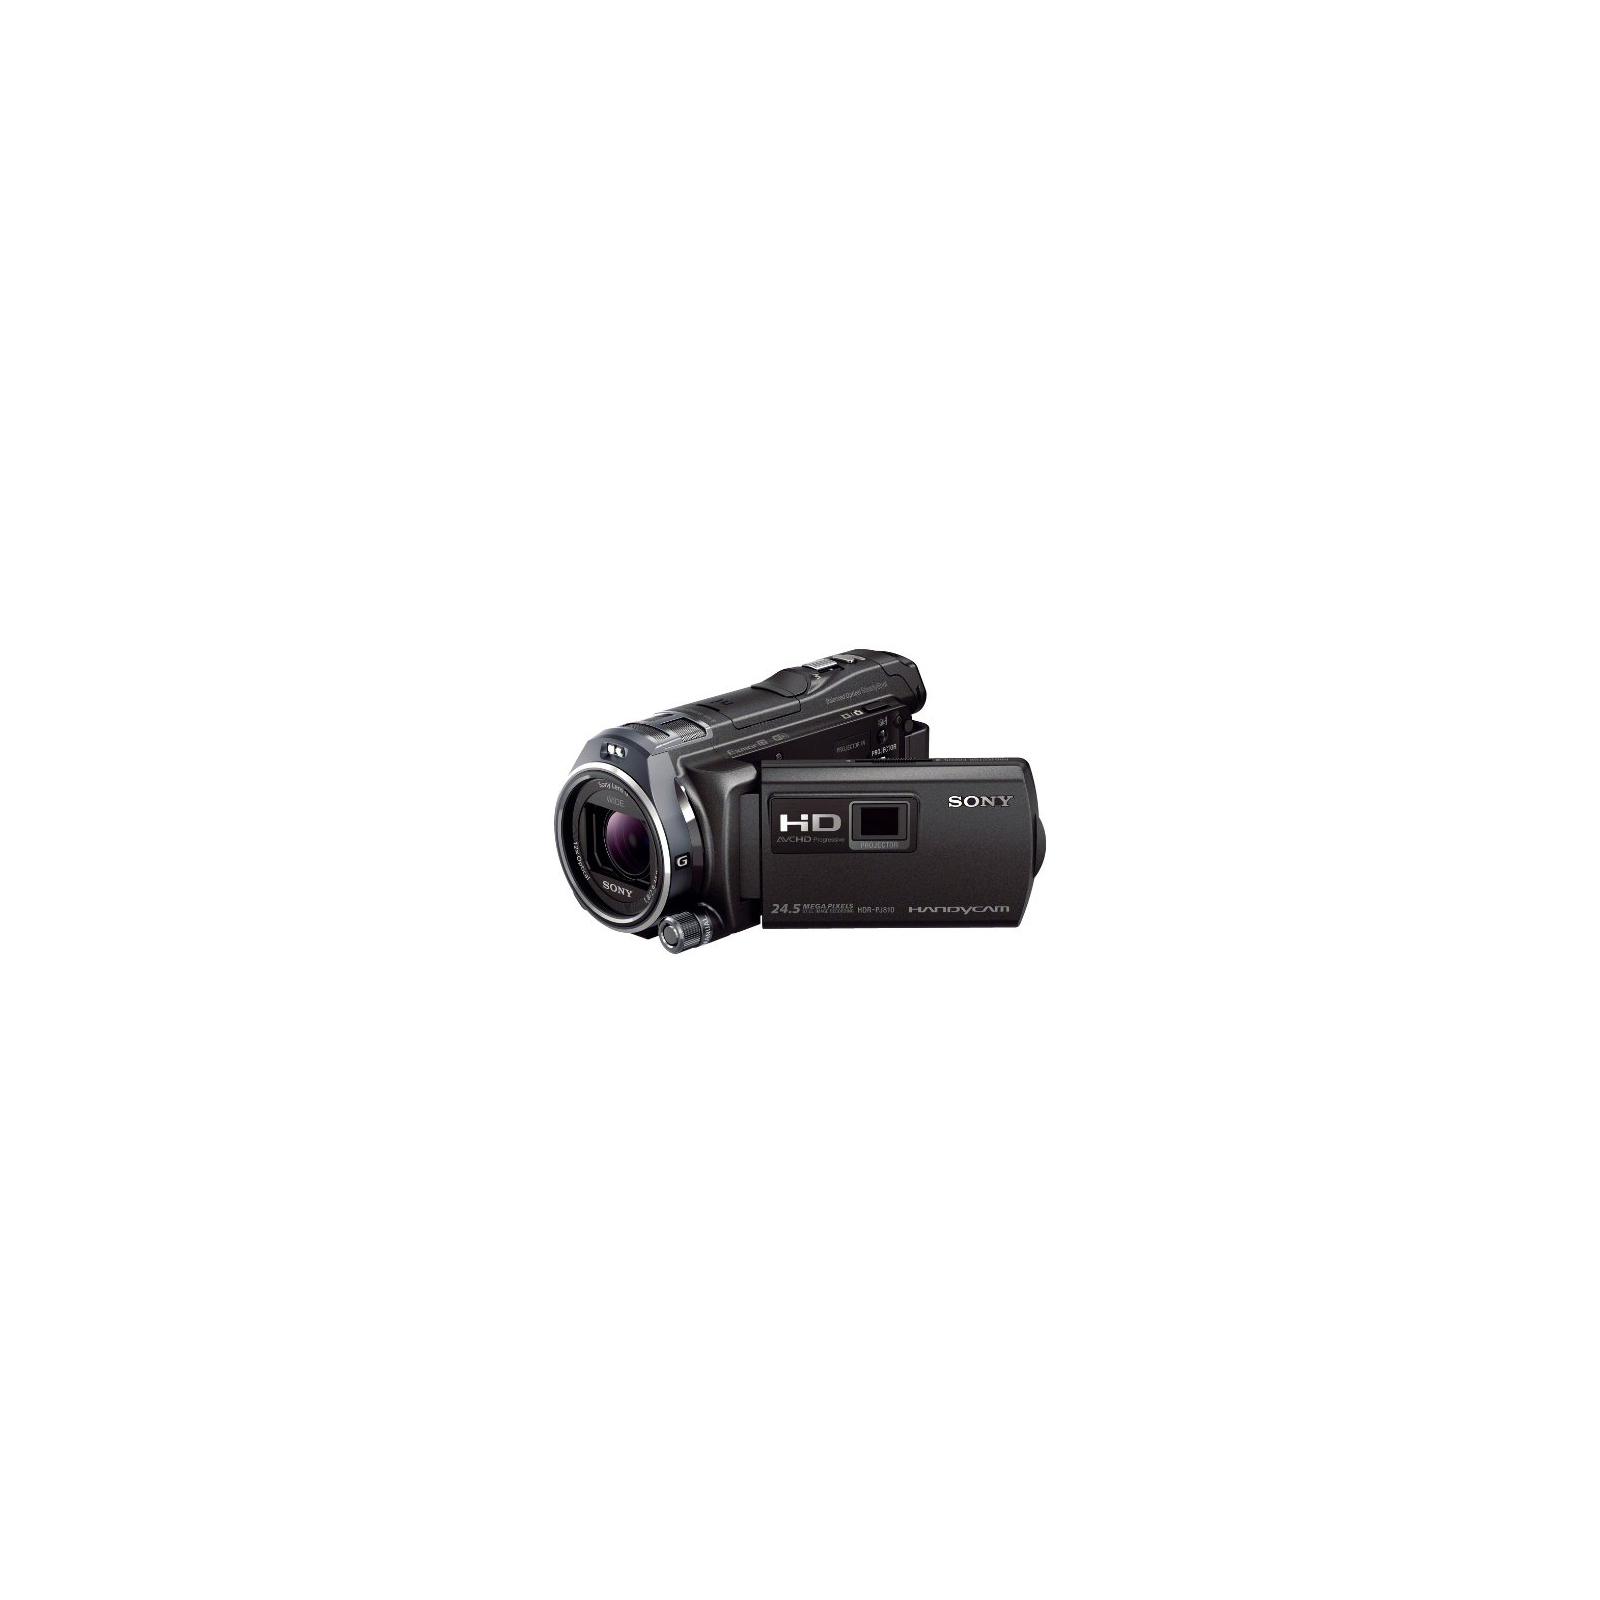 Цифровая видеокамера SONY Handycam HDR-PJ810 Black (HDRPJ810EB.CEL) изображение 2